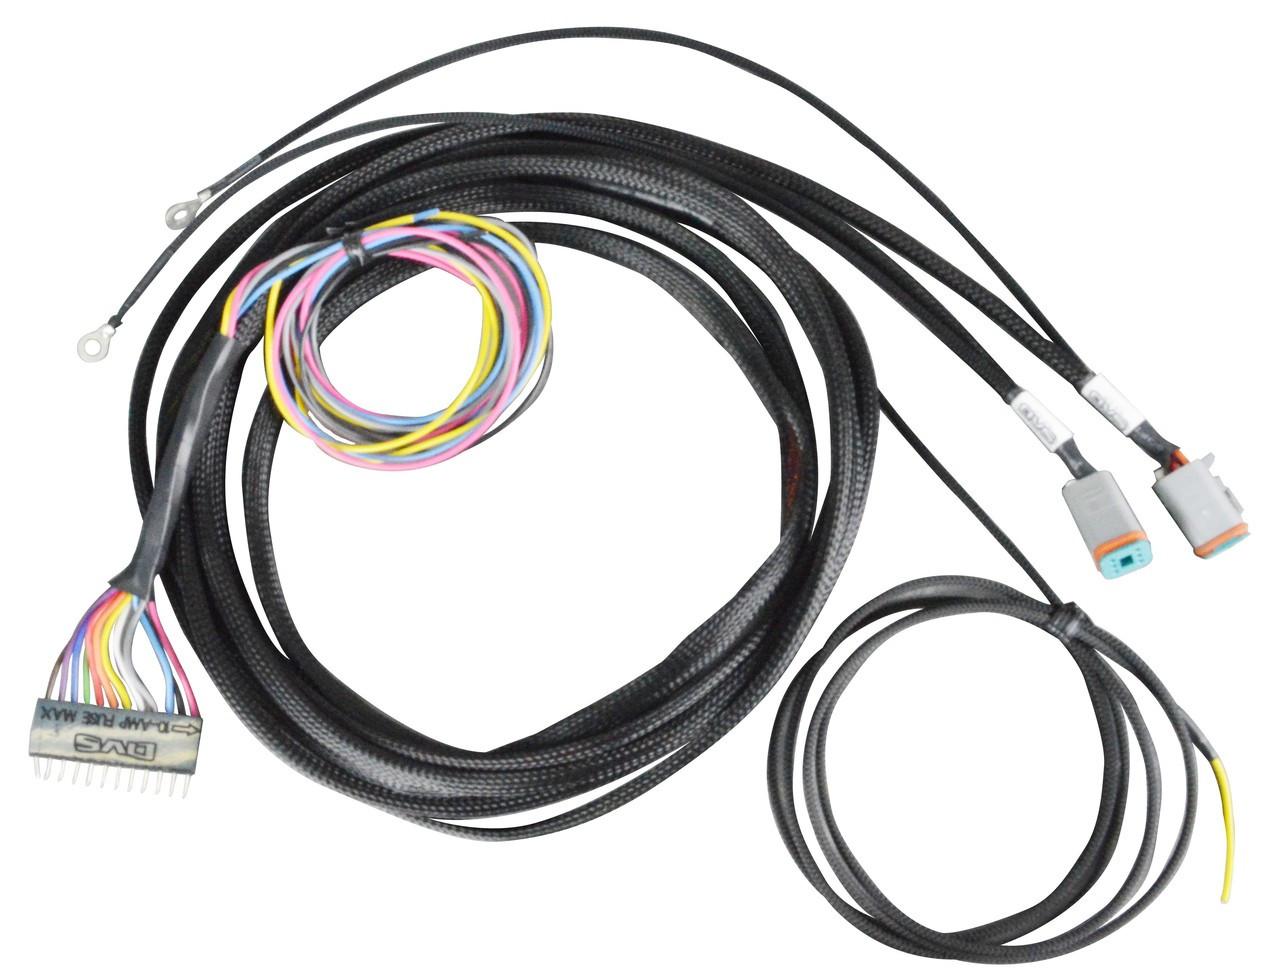 avs valve wiring harness 12\u0027, 17\u0027, 22\u0027 accuair endo vt tank to avs 9 switch box Wire Harness Plugs